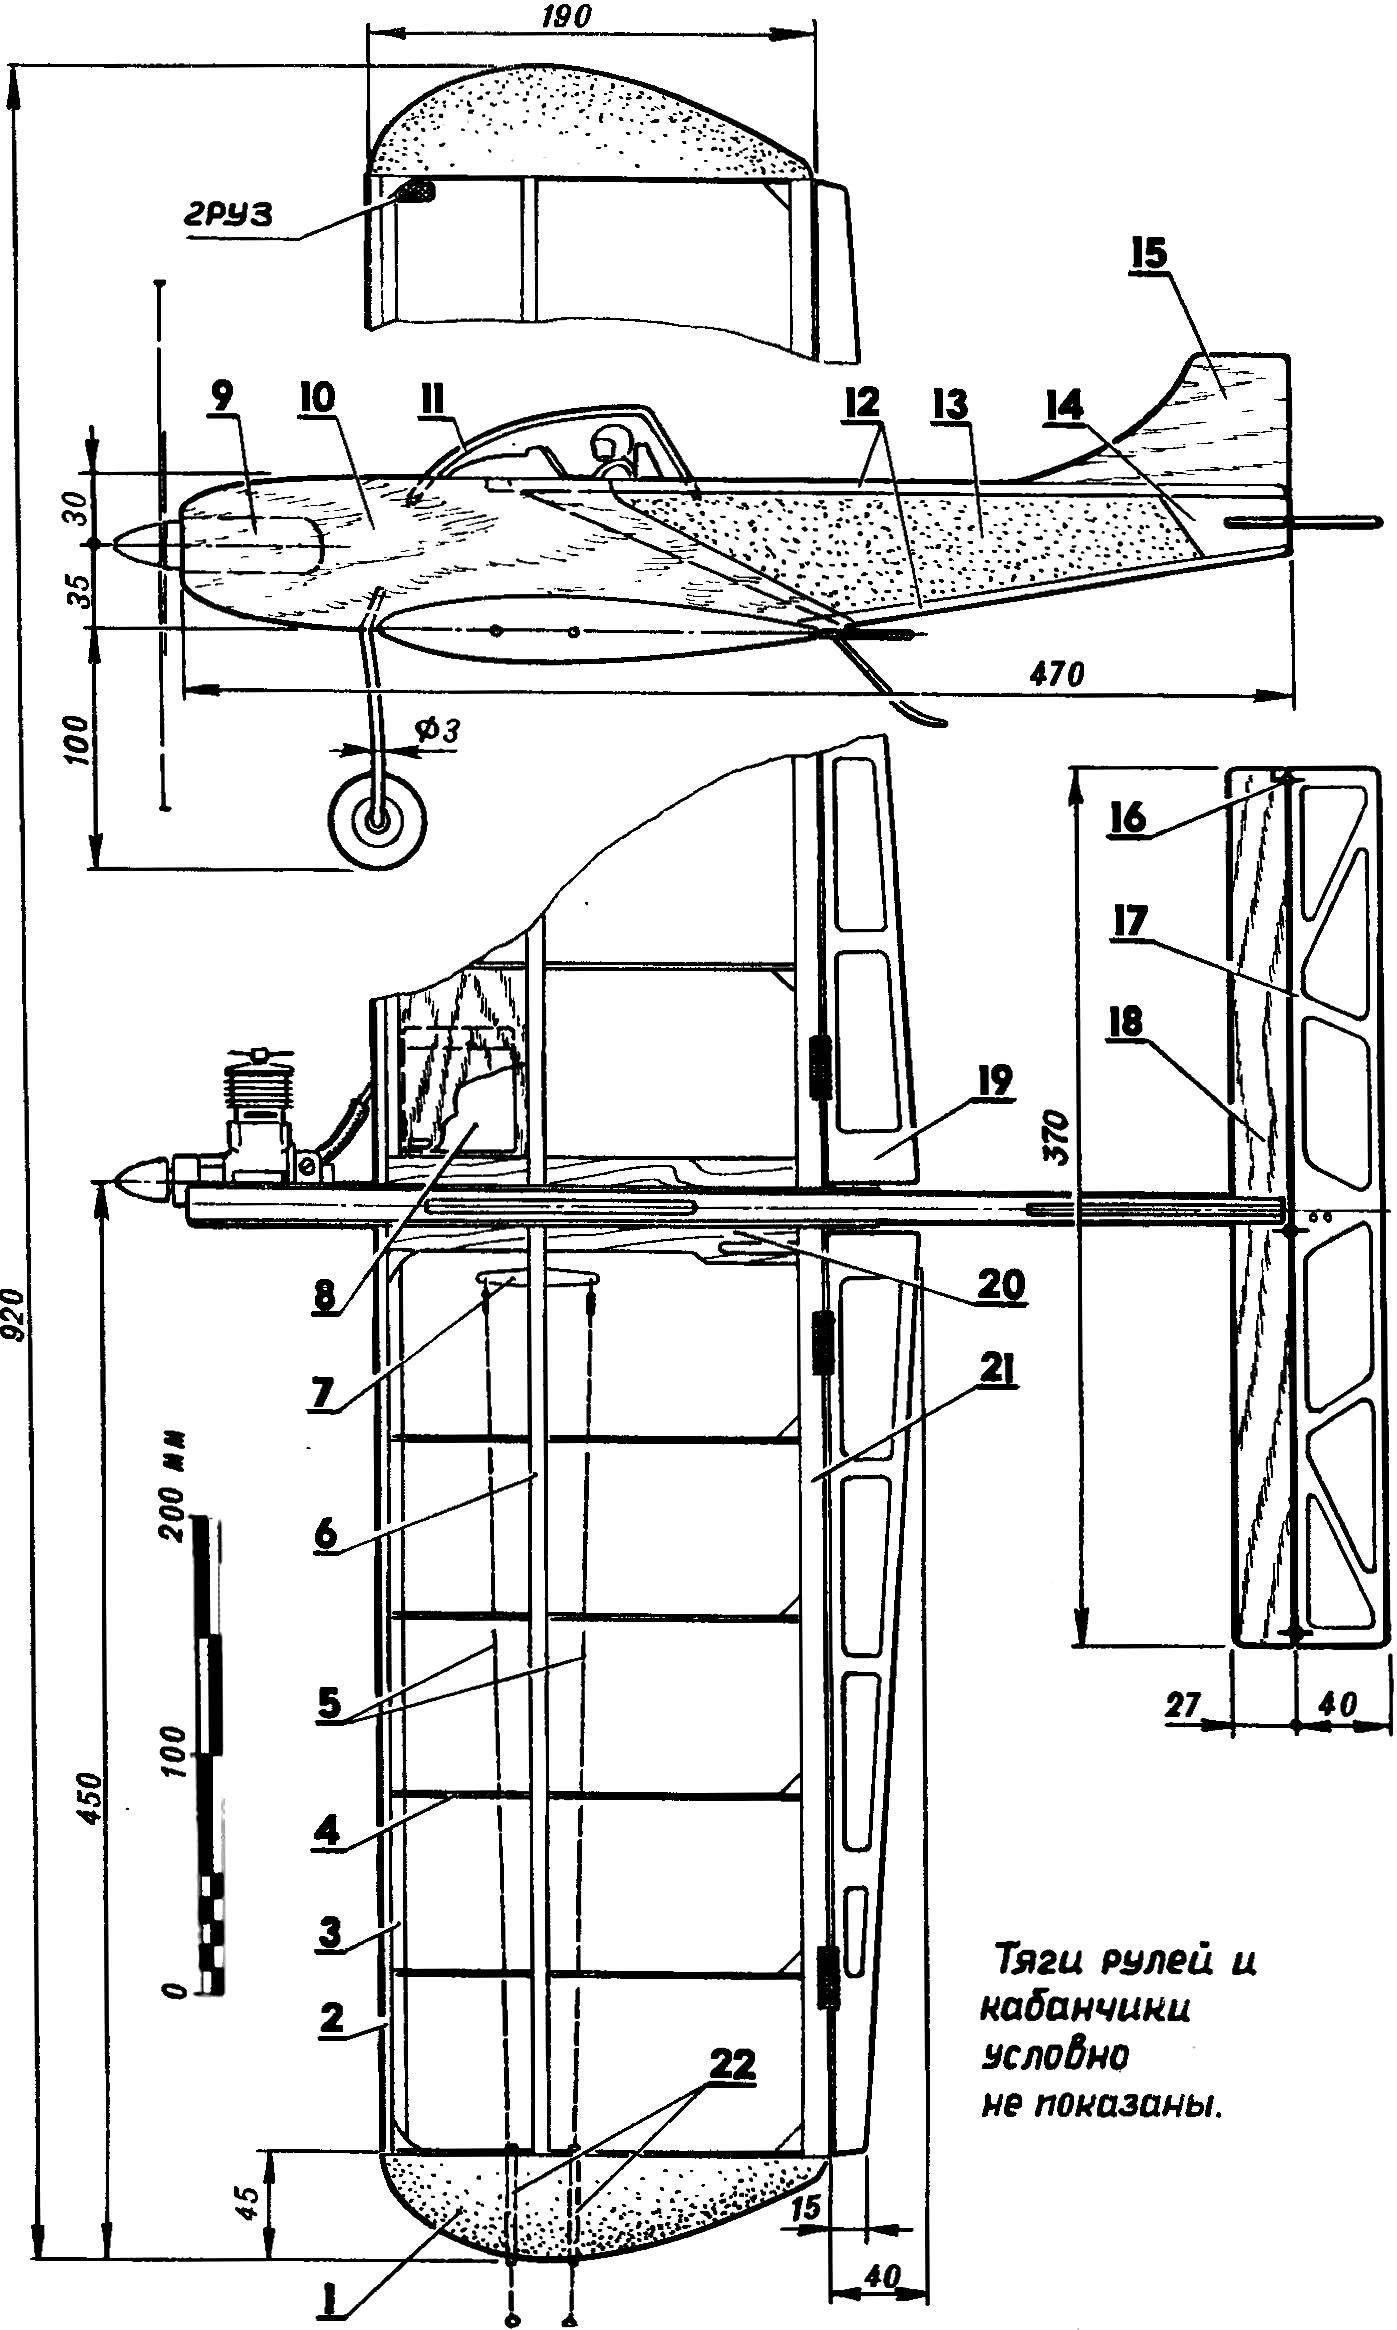 Fig. 2. Training and flight model engine MARZ-2.5 million.